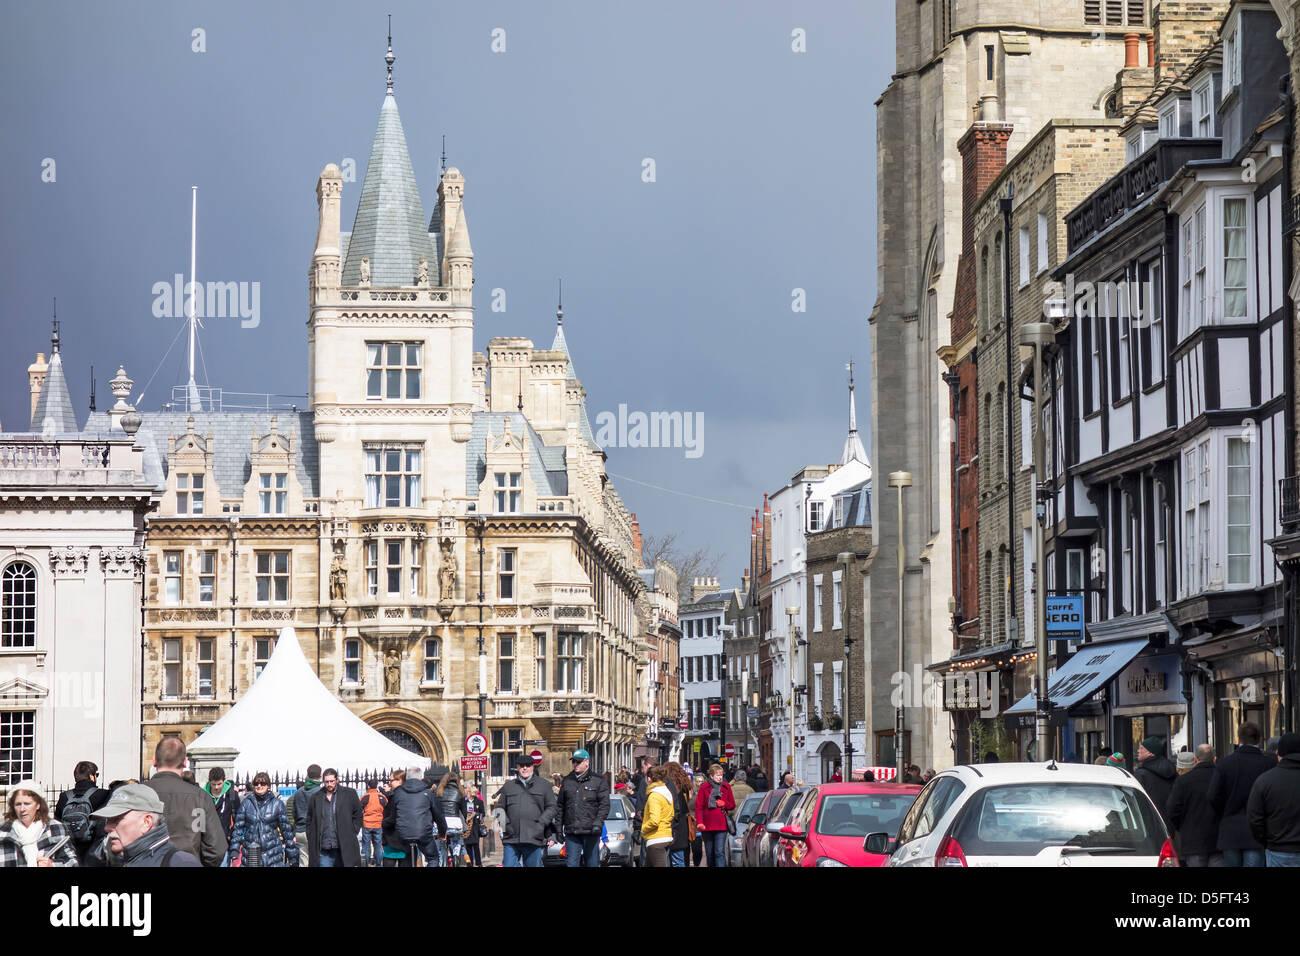 Kings Parade Cambridge England - Stock Image